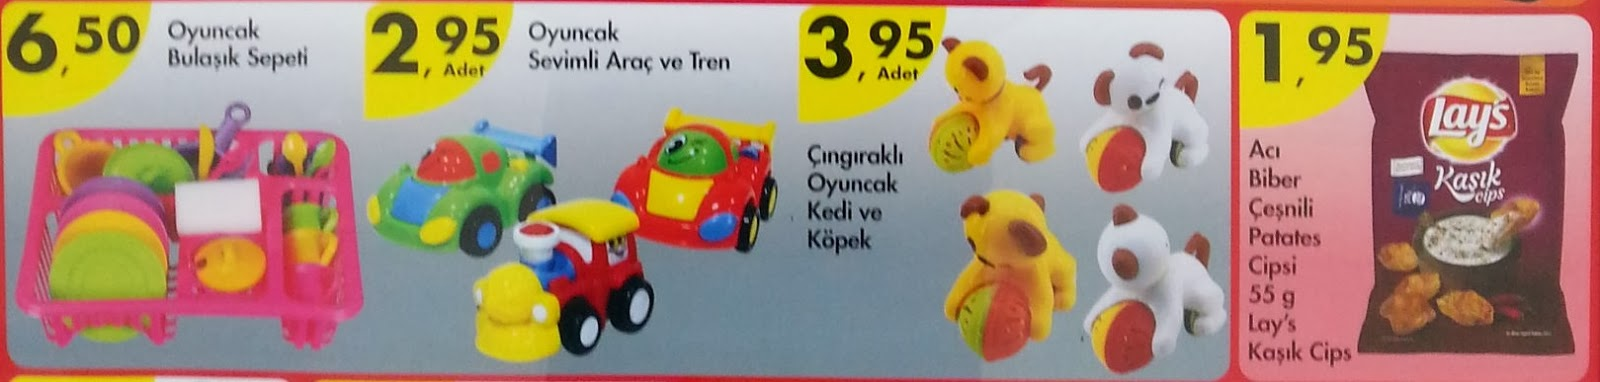 http://haberfirsat.blogspot.com.tr/2014/02/a101-6-mart-2014-cocuk-oyuncaklar-ve.html